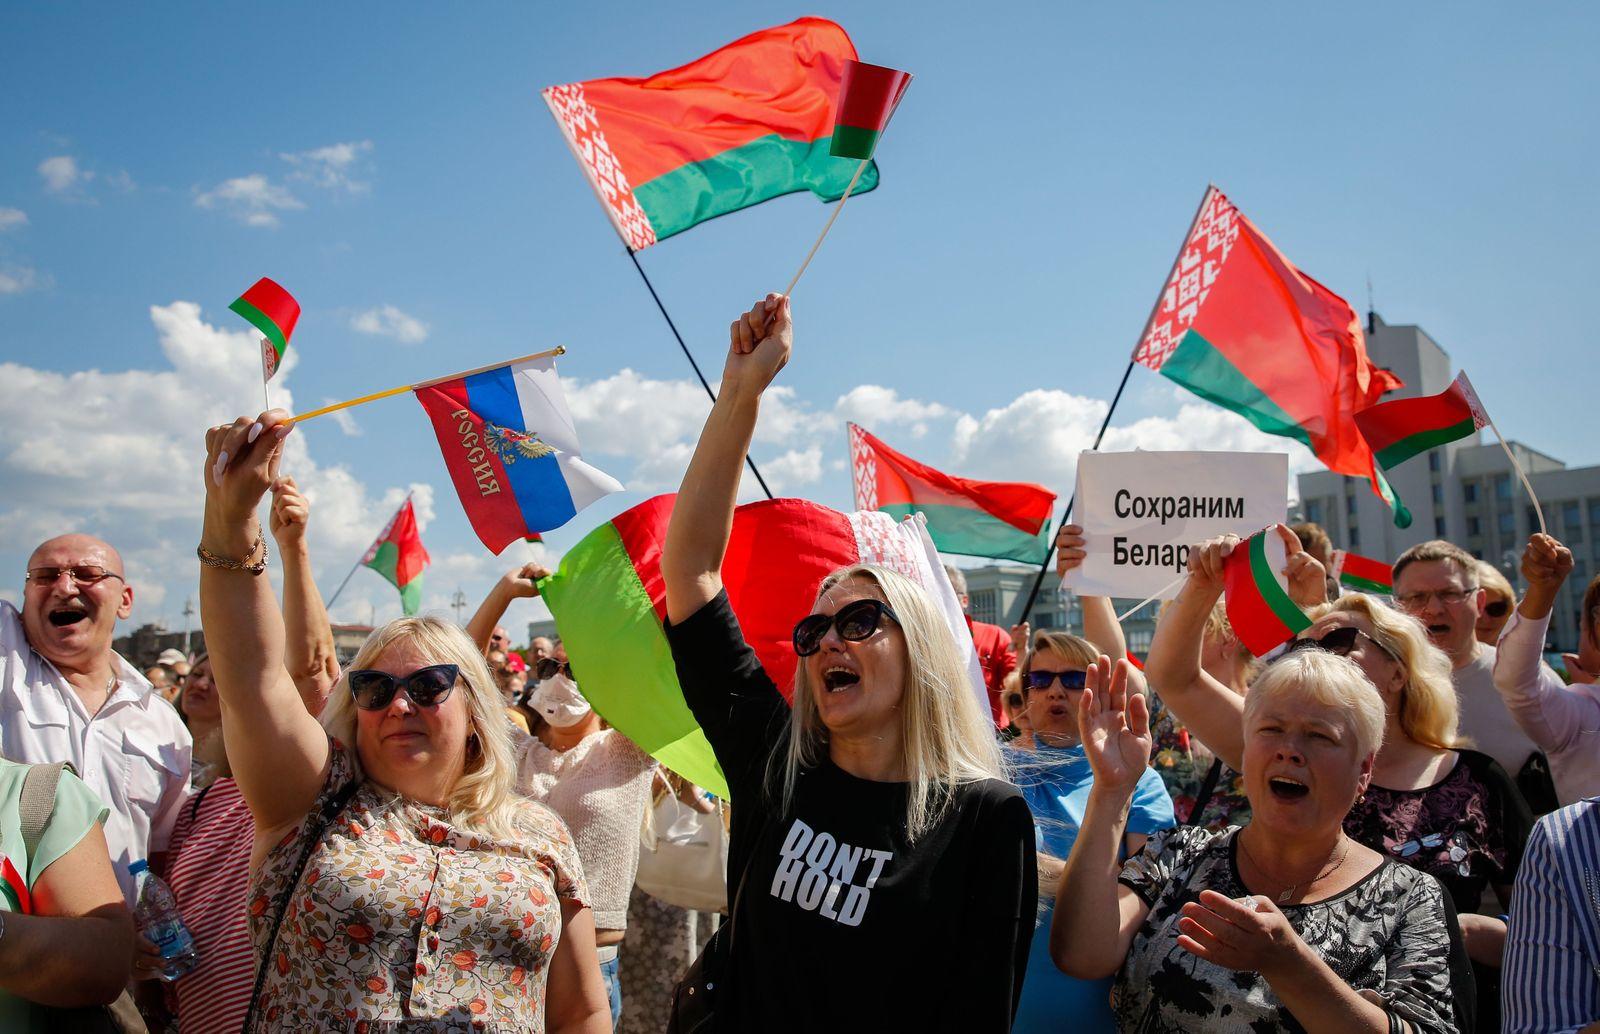 Supporters of Belarusian President Alexander Lukashenko rally in Minsk, Belarus - 16 Aug 2020